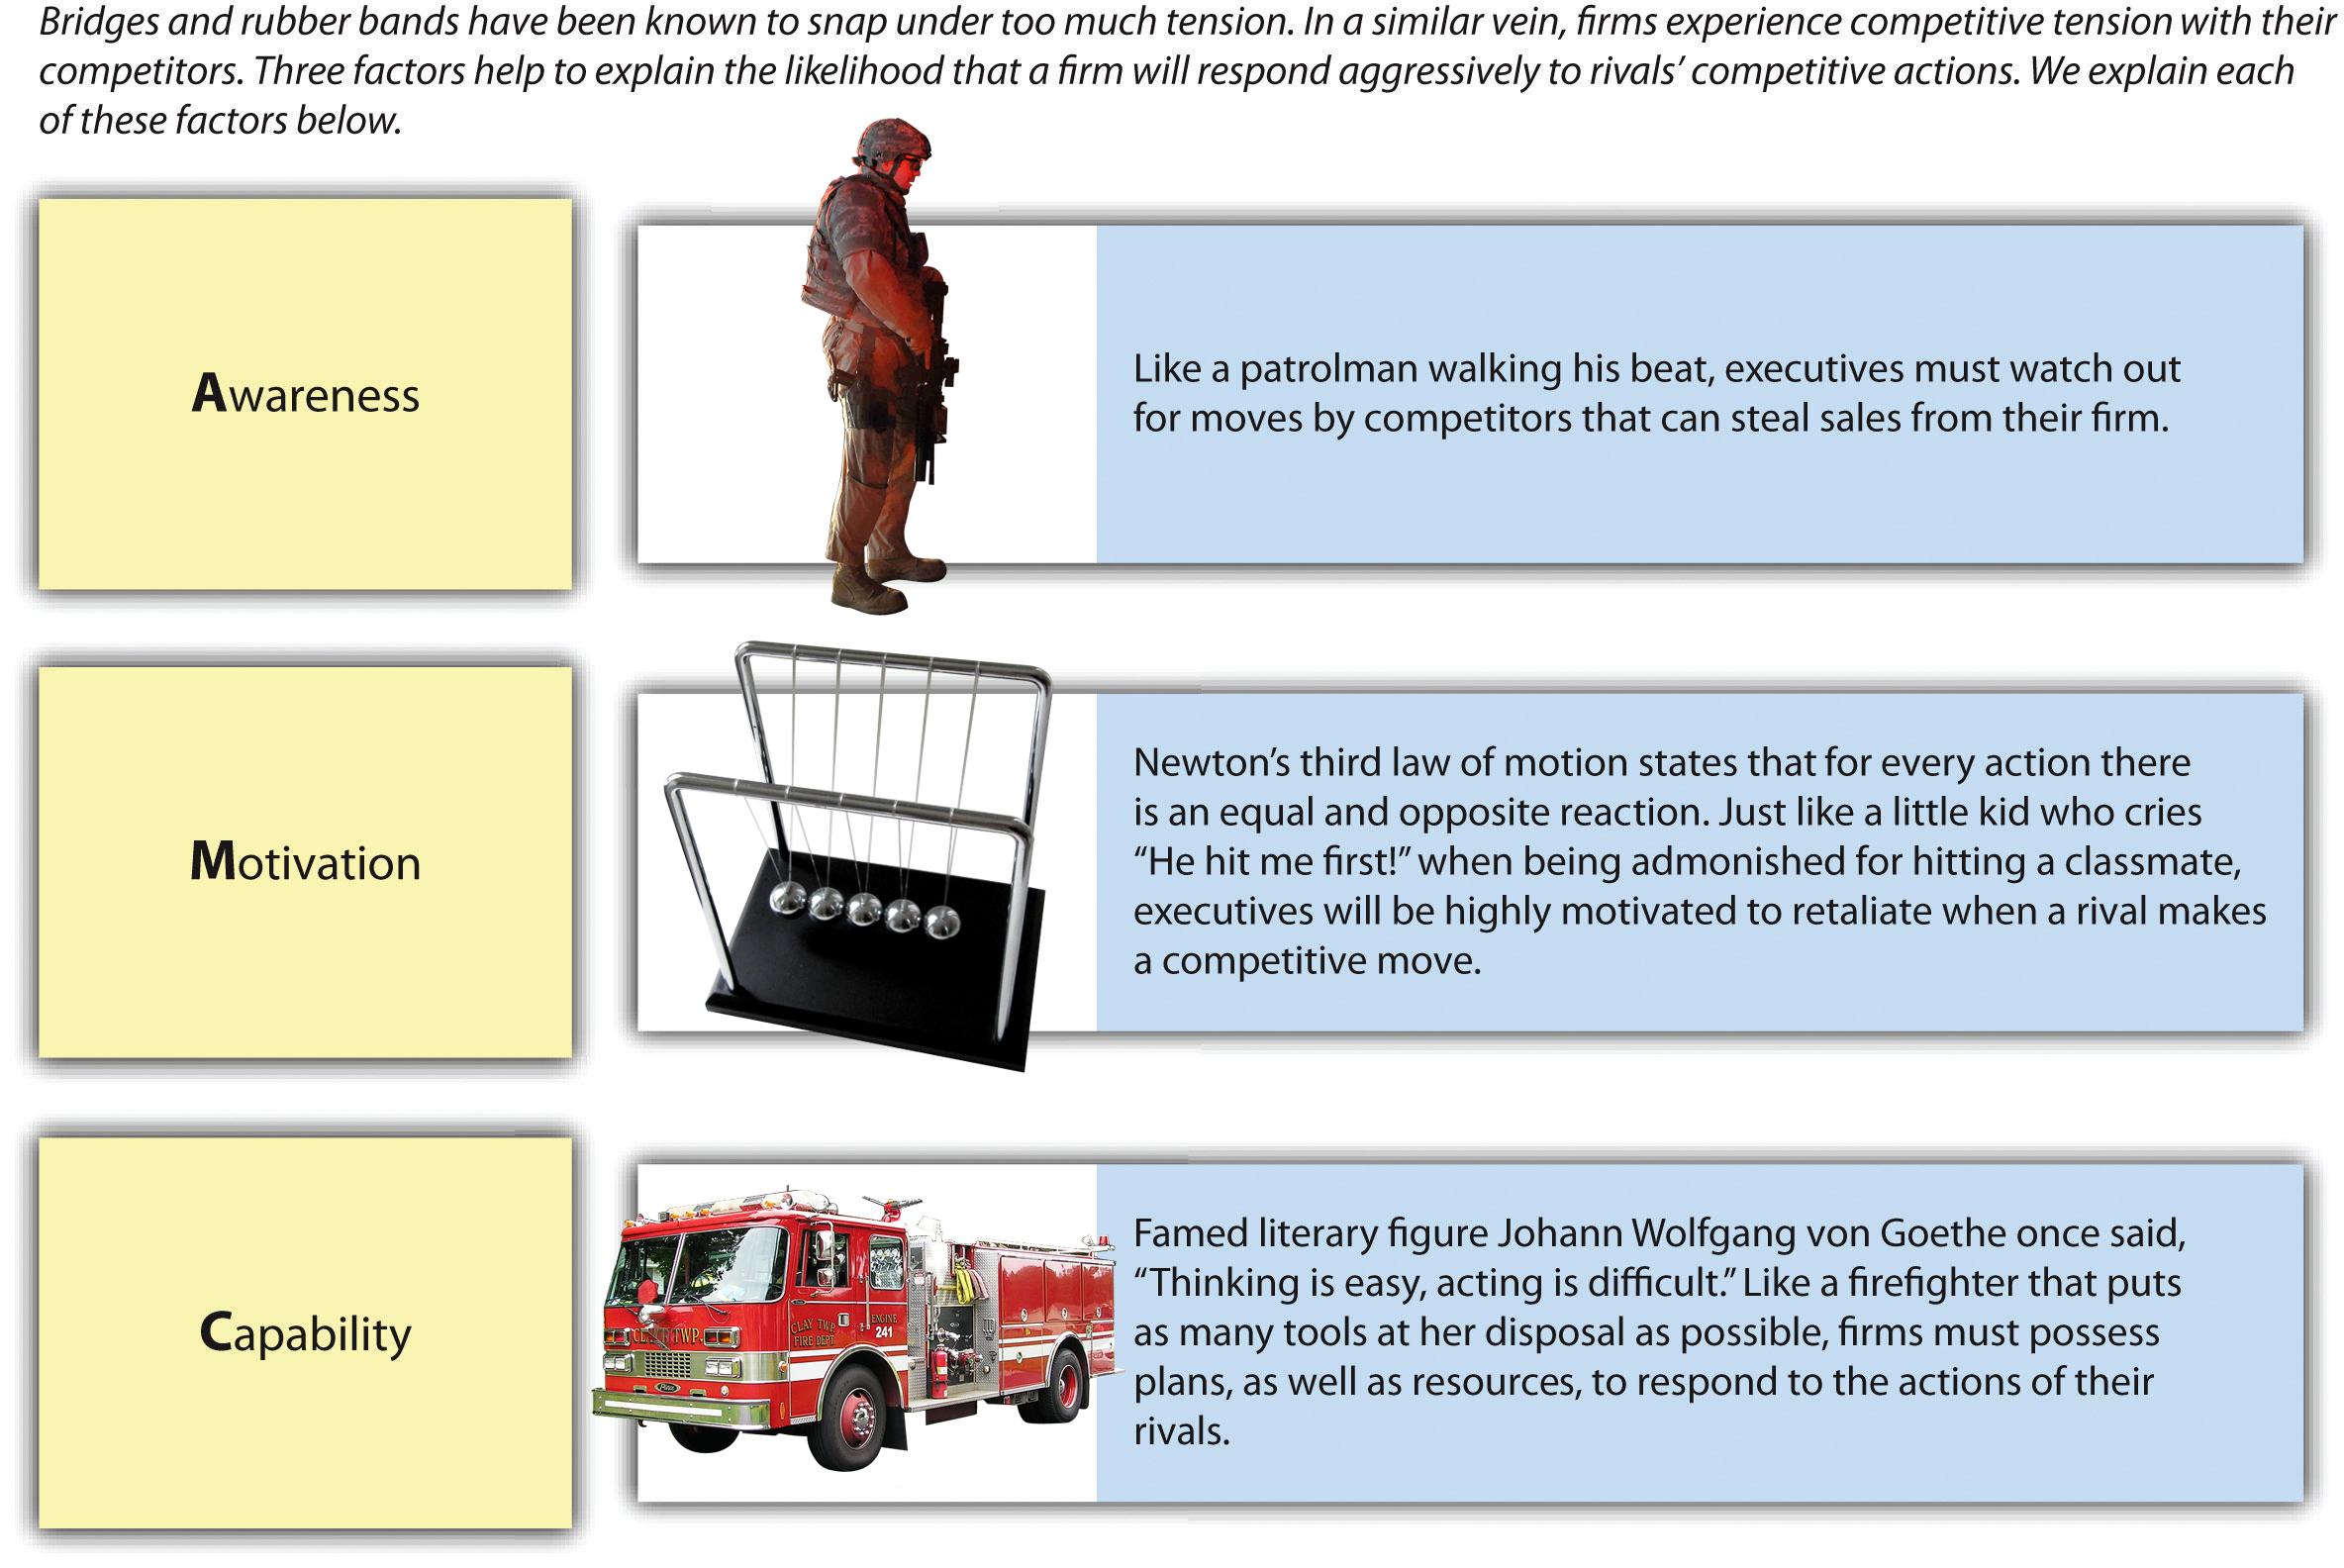 Figure 6-11: Competitive Tension: The A-M-C Framework, image description available